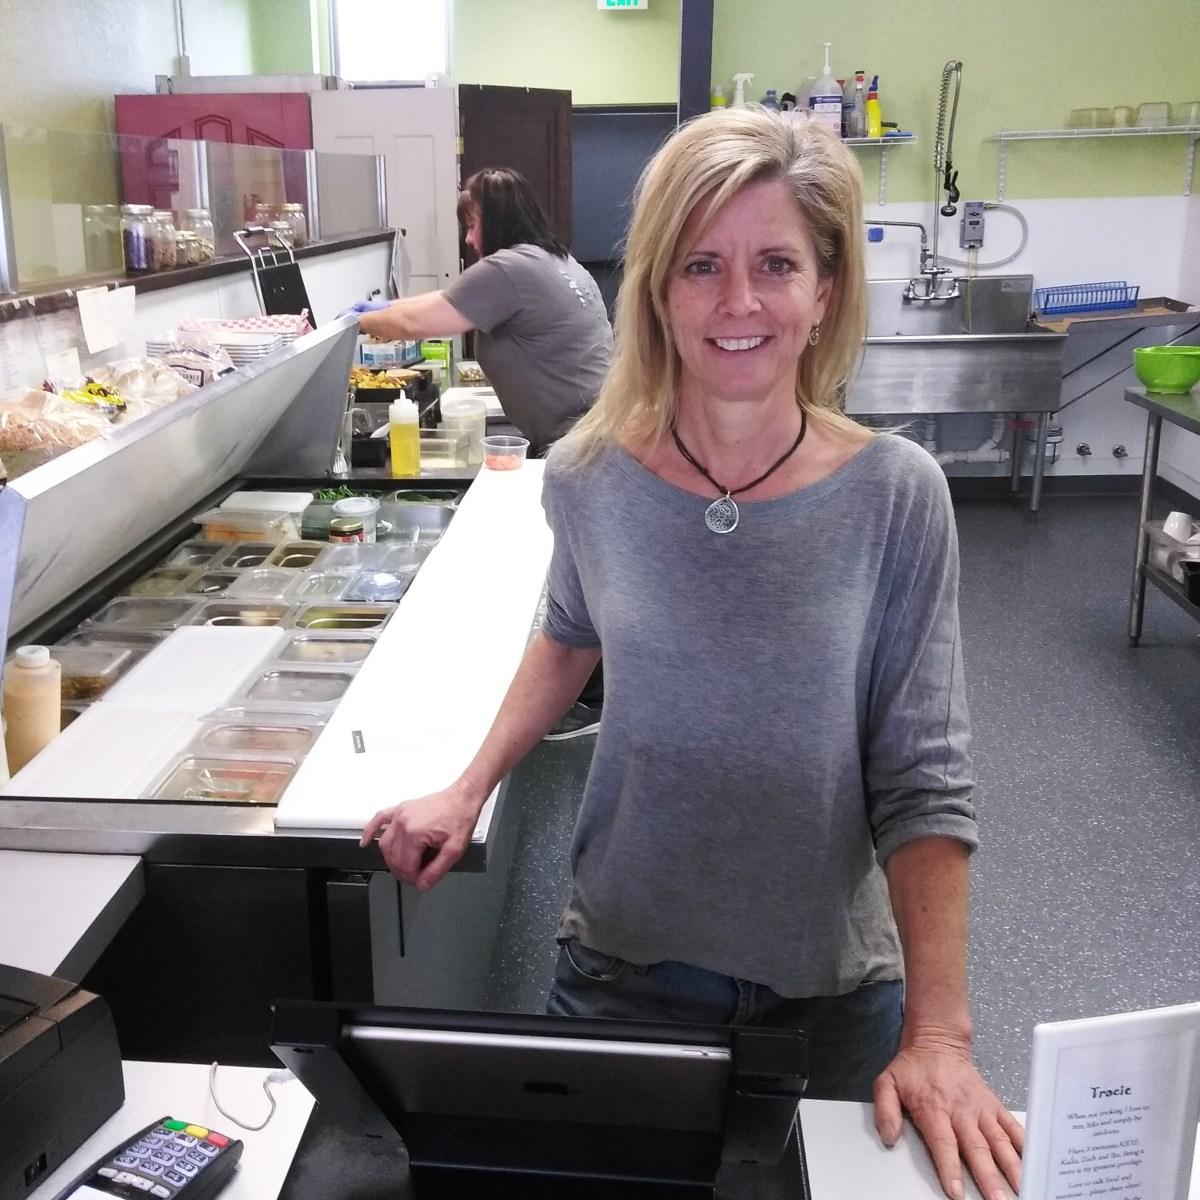 Tracie Reeves Hartman in kitchen